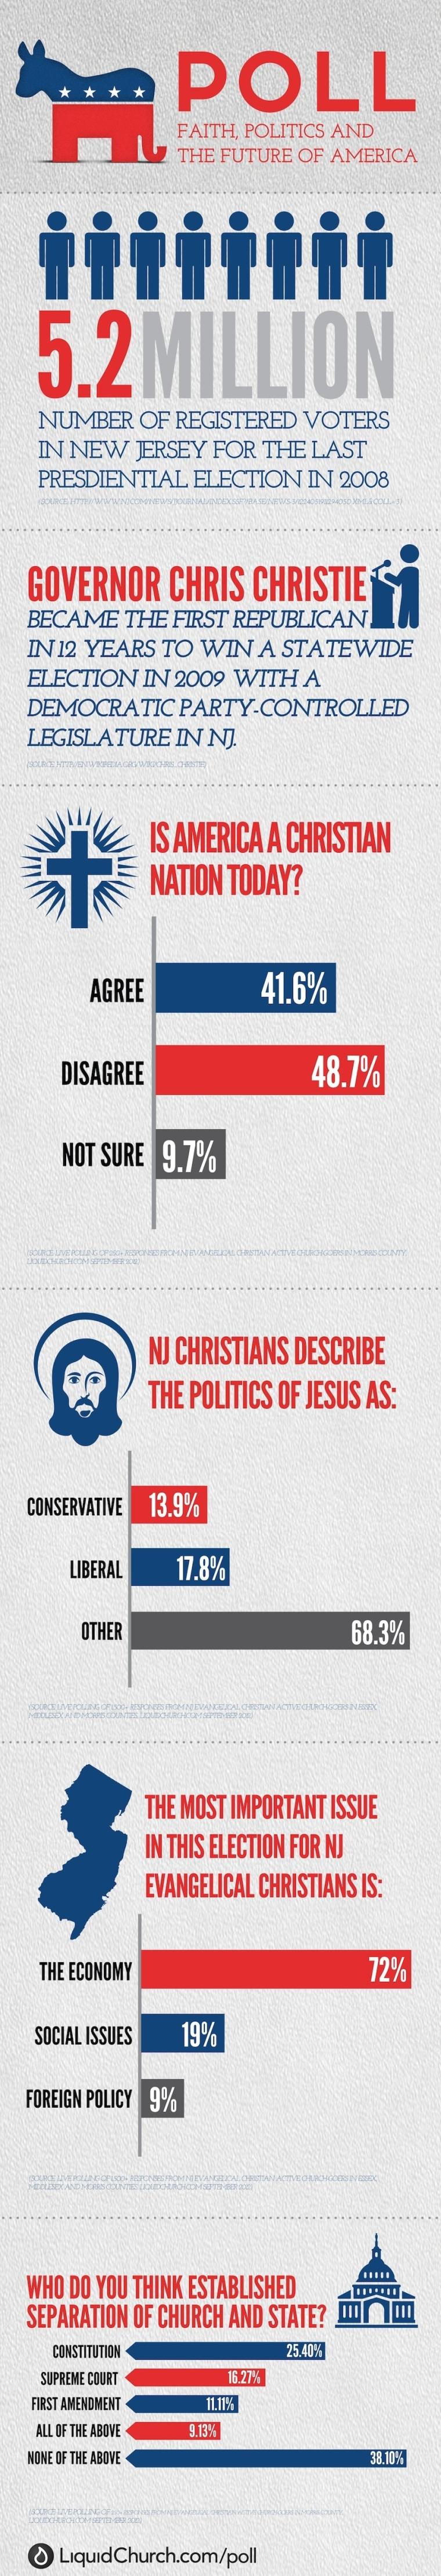 Liquid Church 'Poll' infographic for week 1